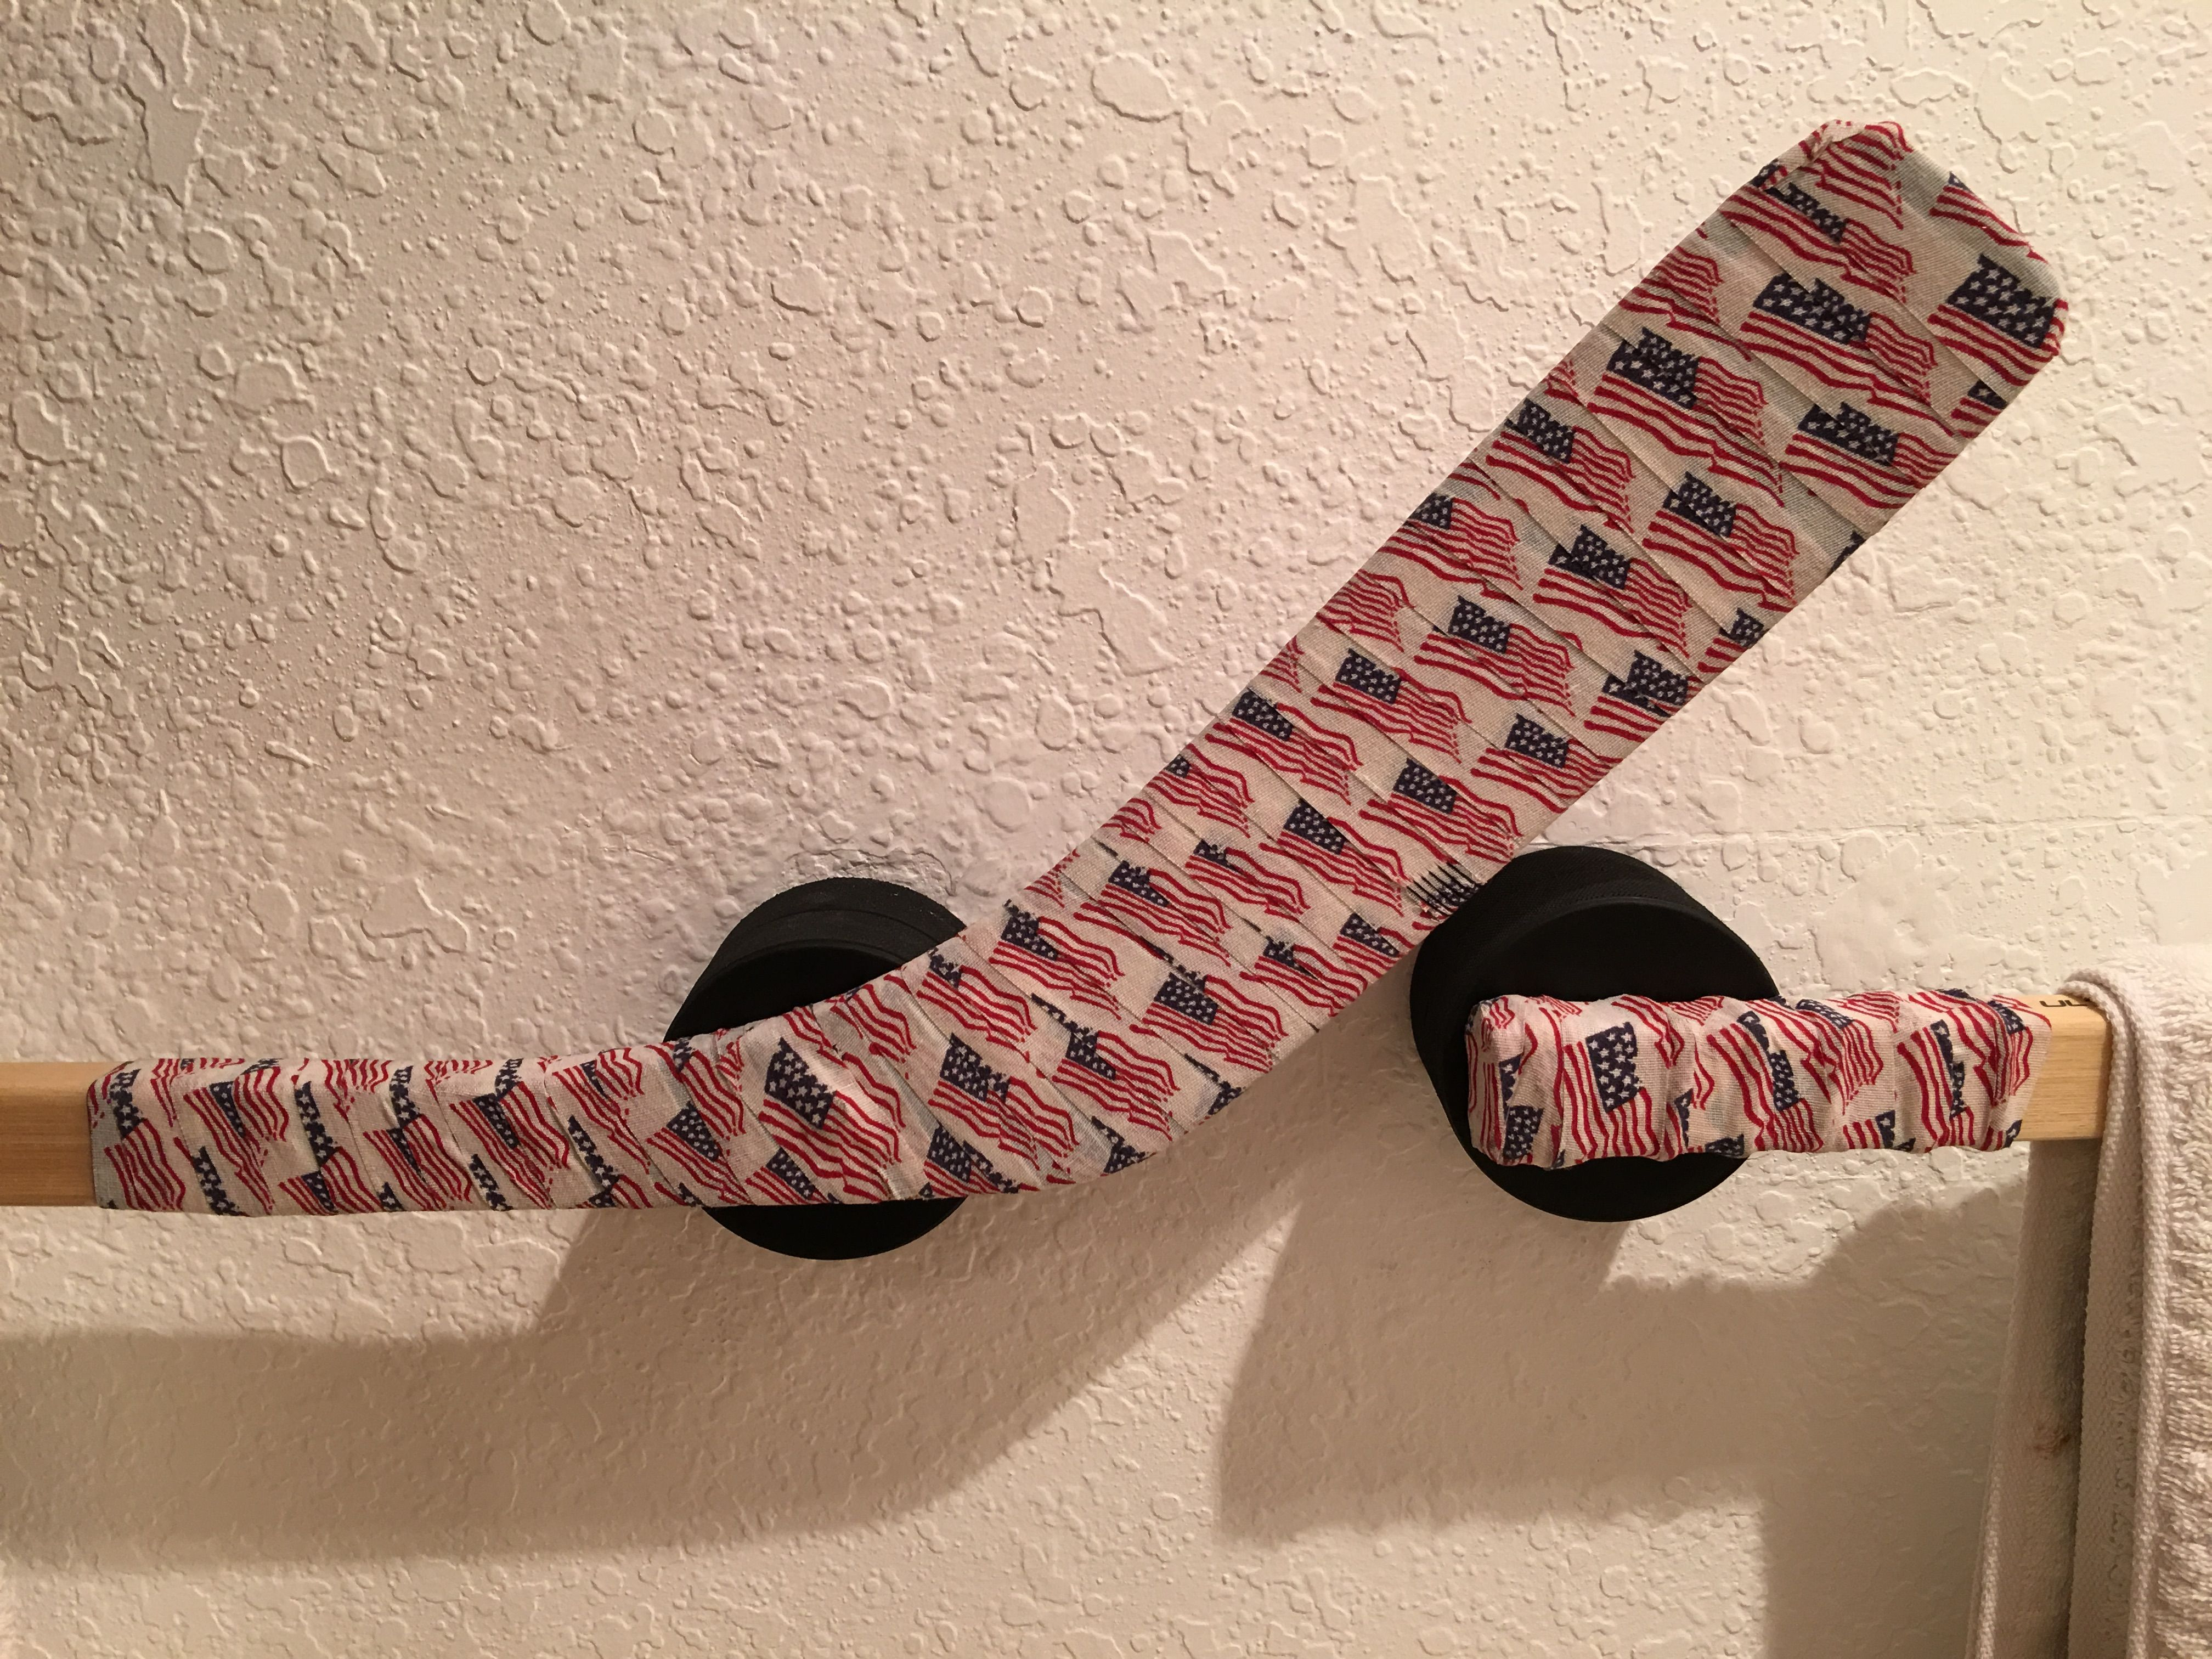 repurposed hockey sticks and pucks for